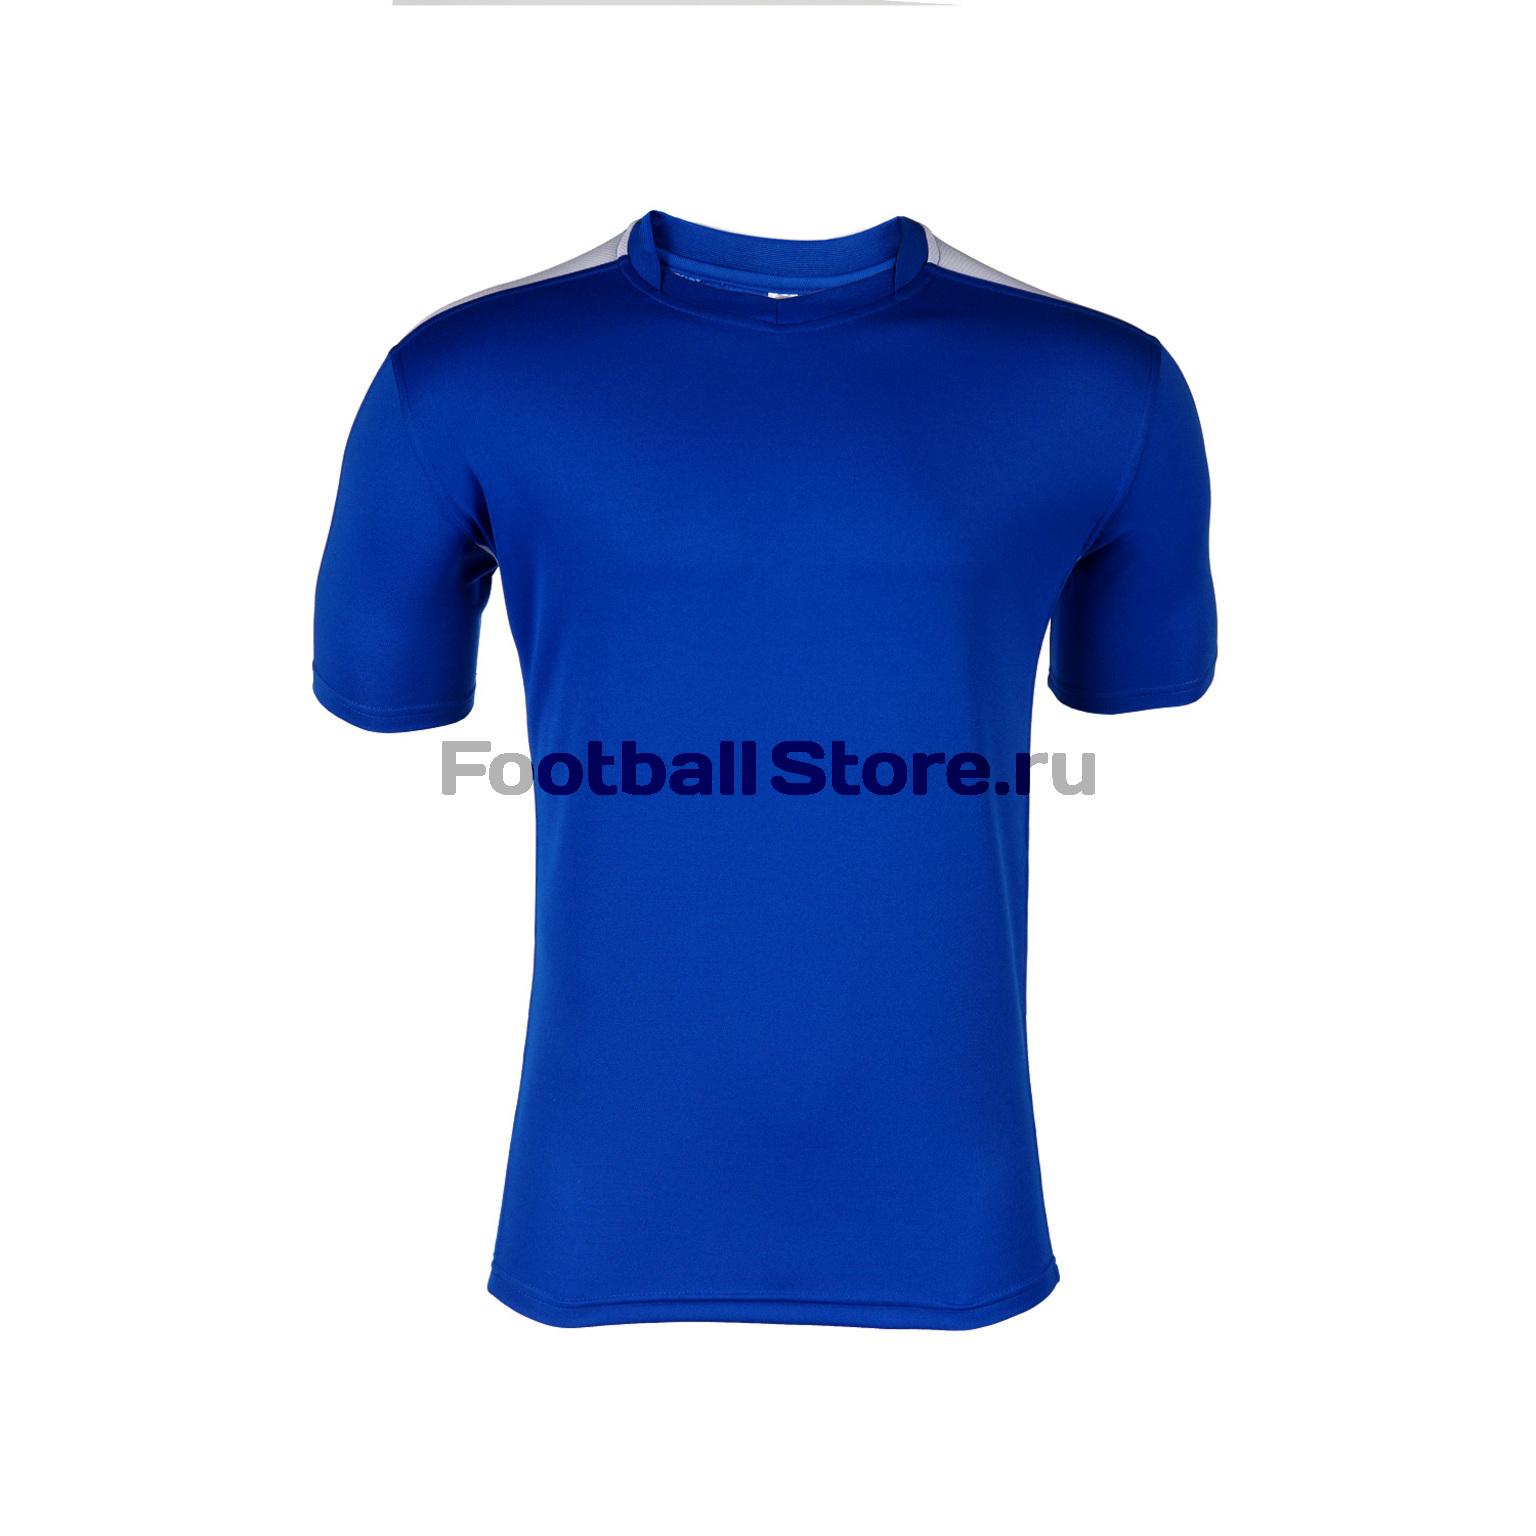 Equipment Sport Футболка игровая ES Football (blue) 14247001-463